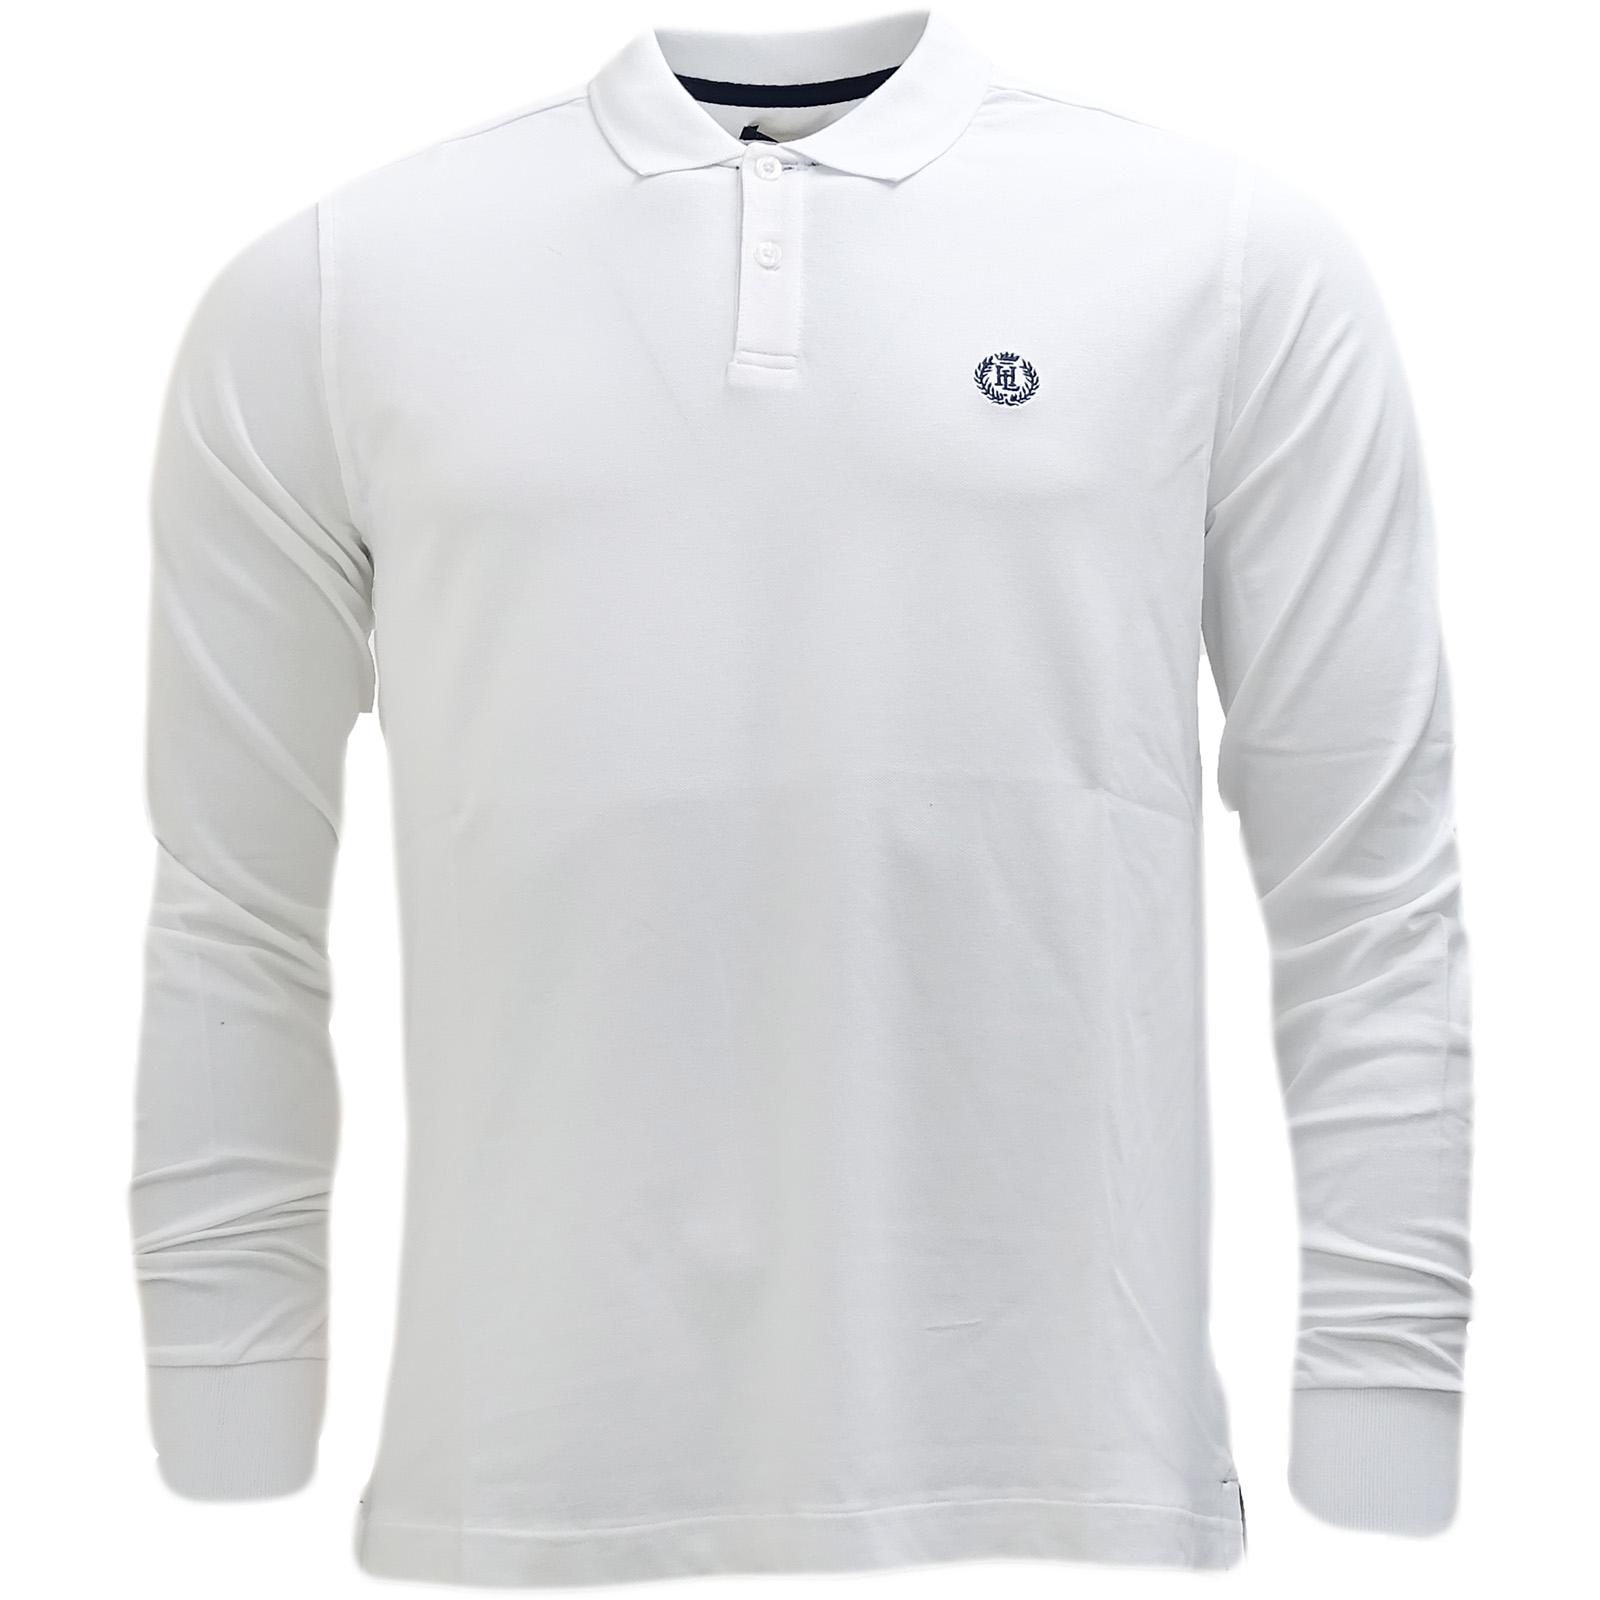 ea6119c93 Henri Lloyd Plain Lightweight Long Sleeve Polo Shirt - Musburry | eBay